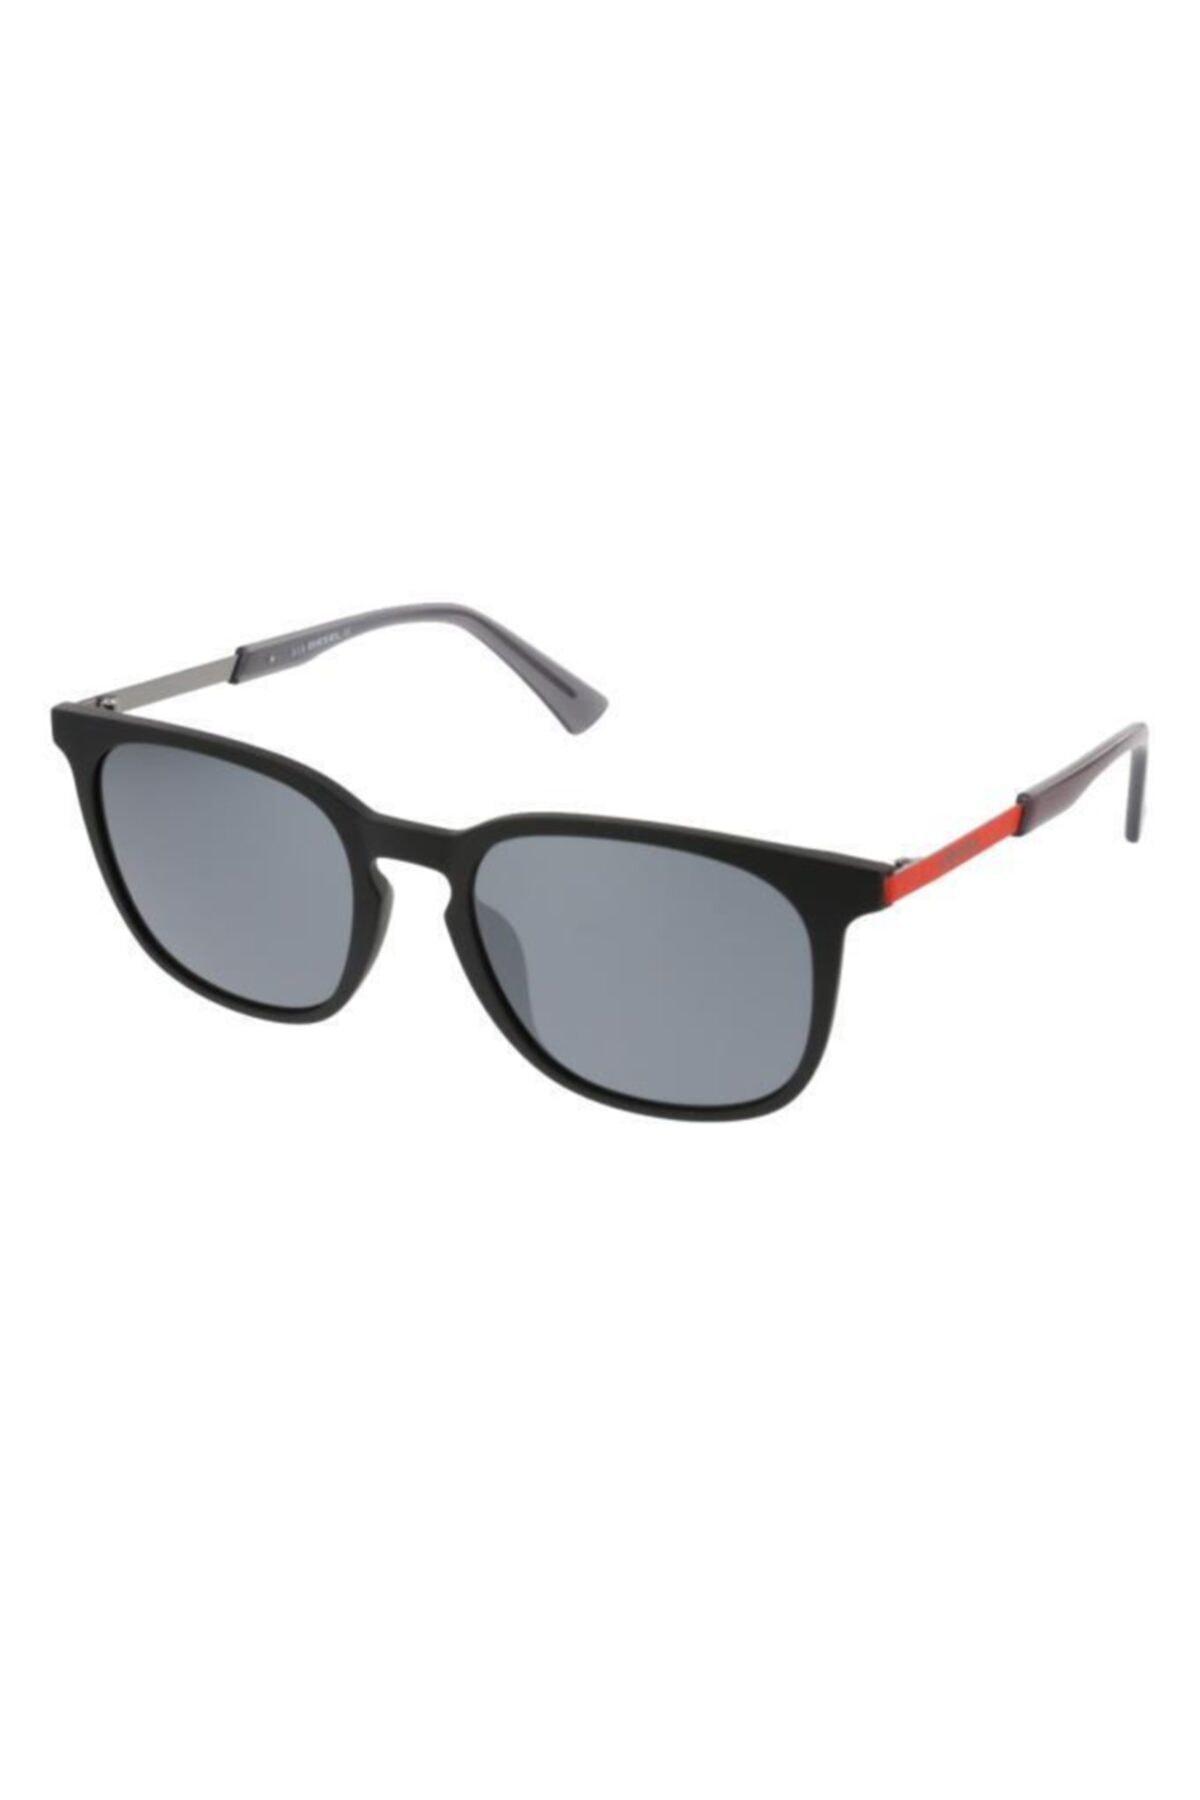 عینک دودی خفن برند دیزل رنگ مشکی کد ty87648935